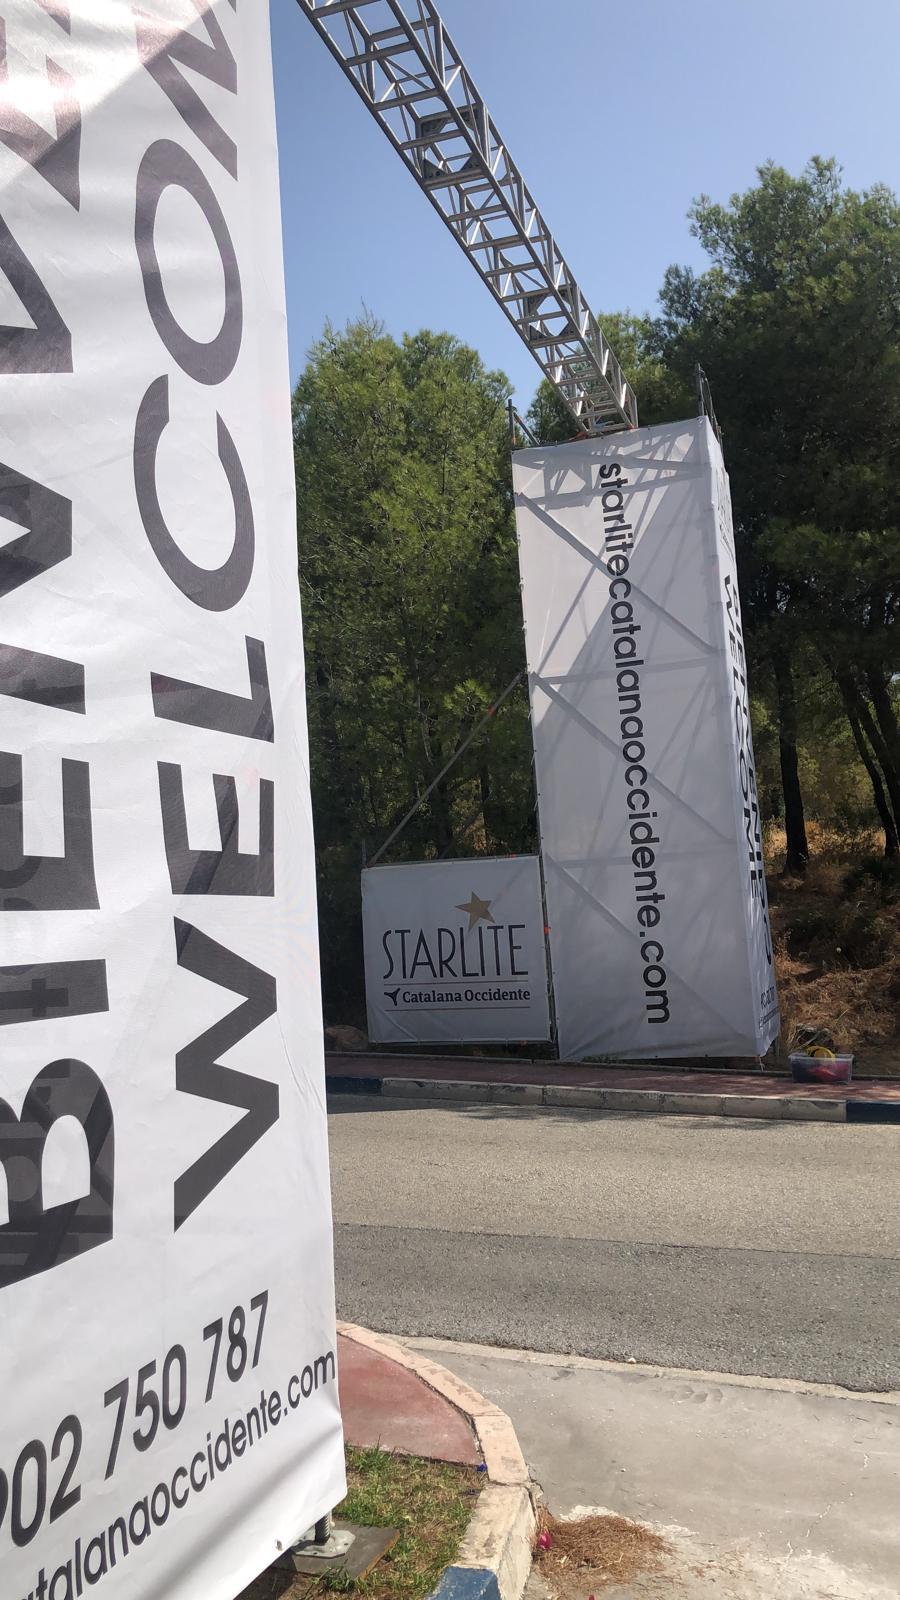 Torre de entrada coches para festival Starlite